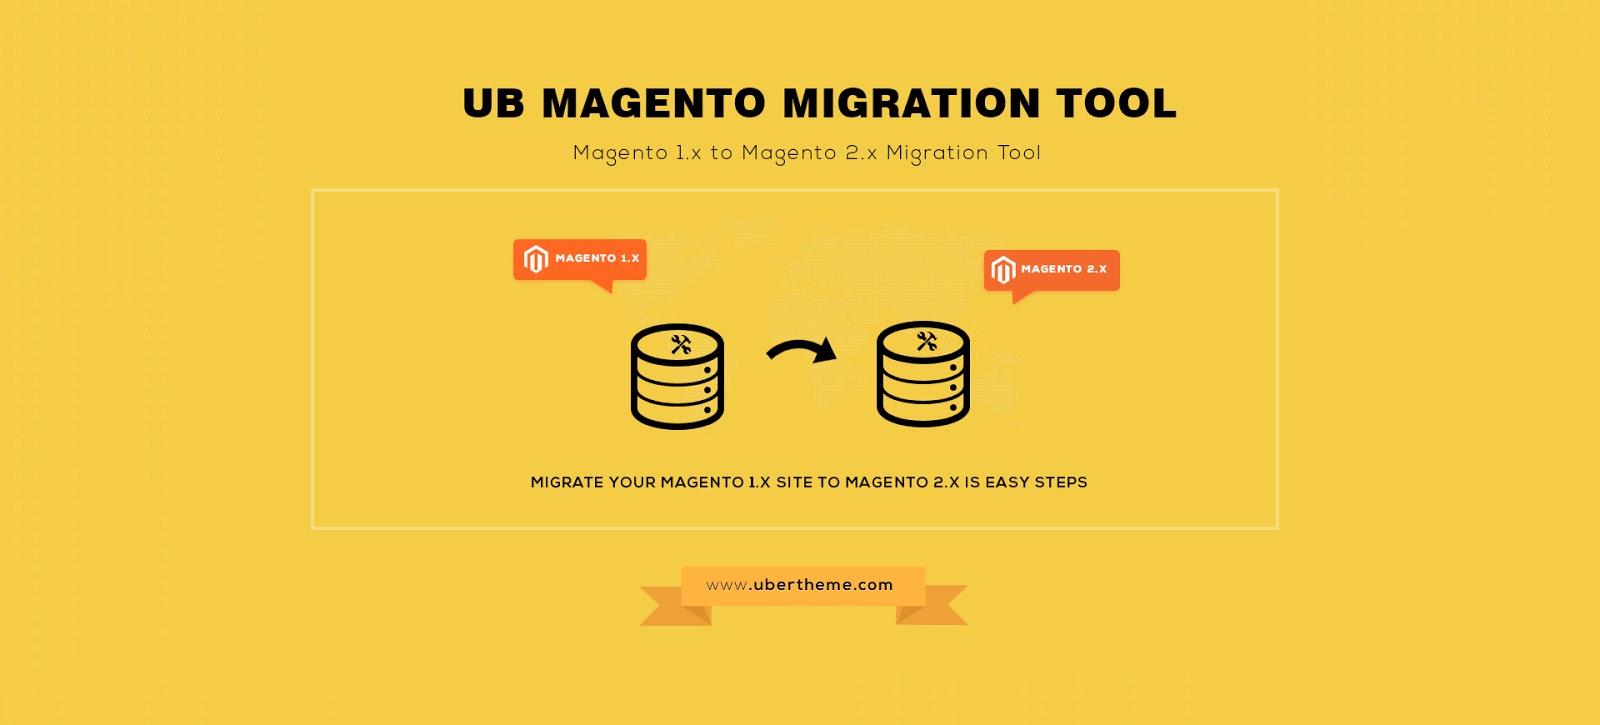 UB Magento Migration Tool